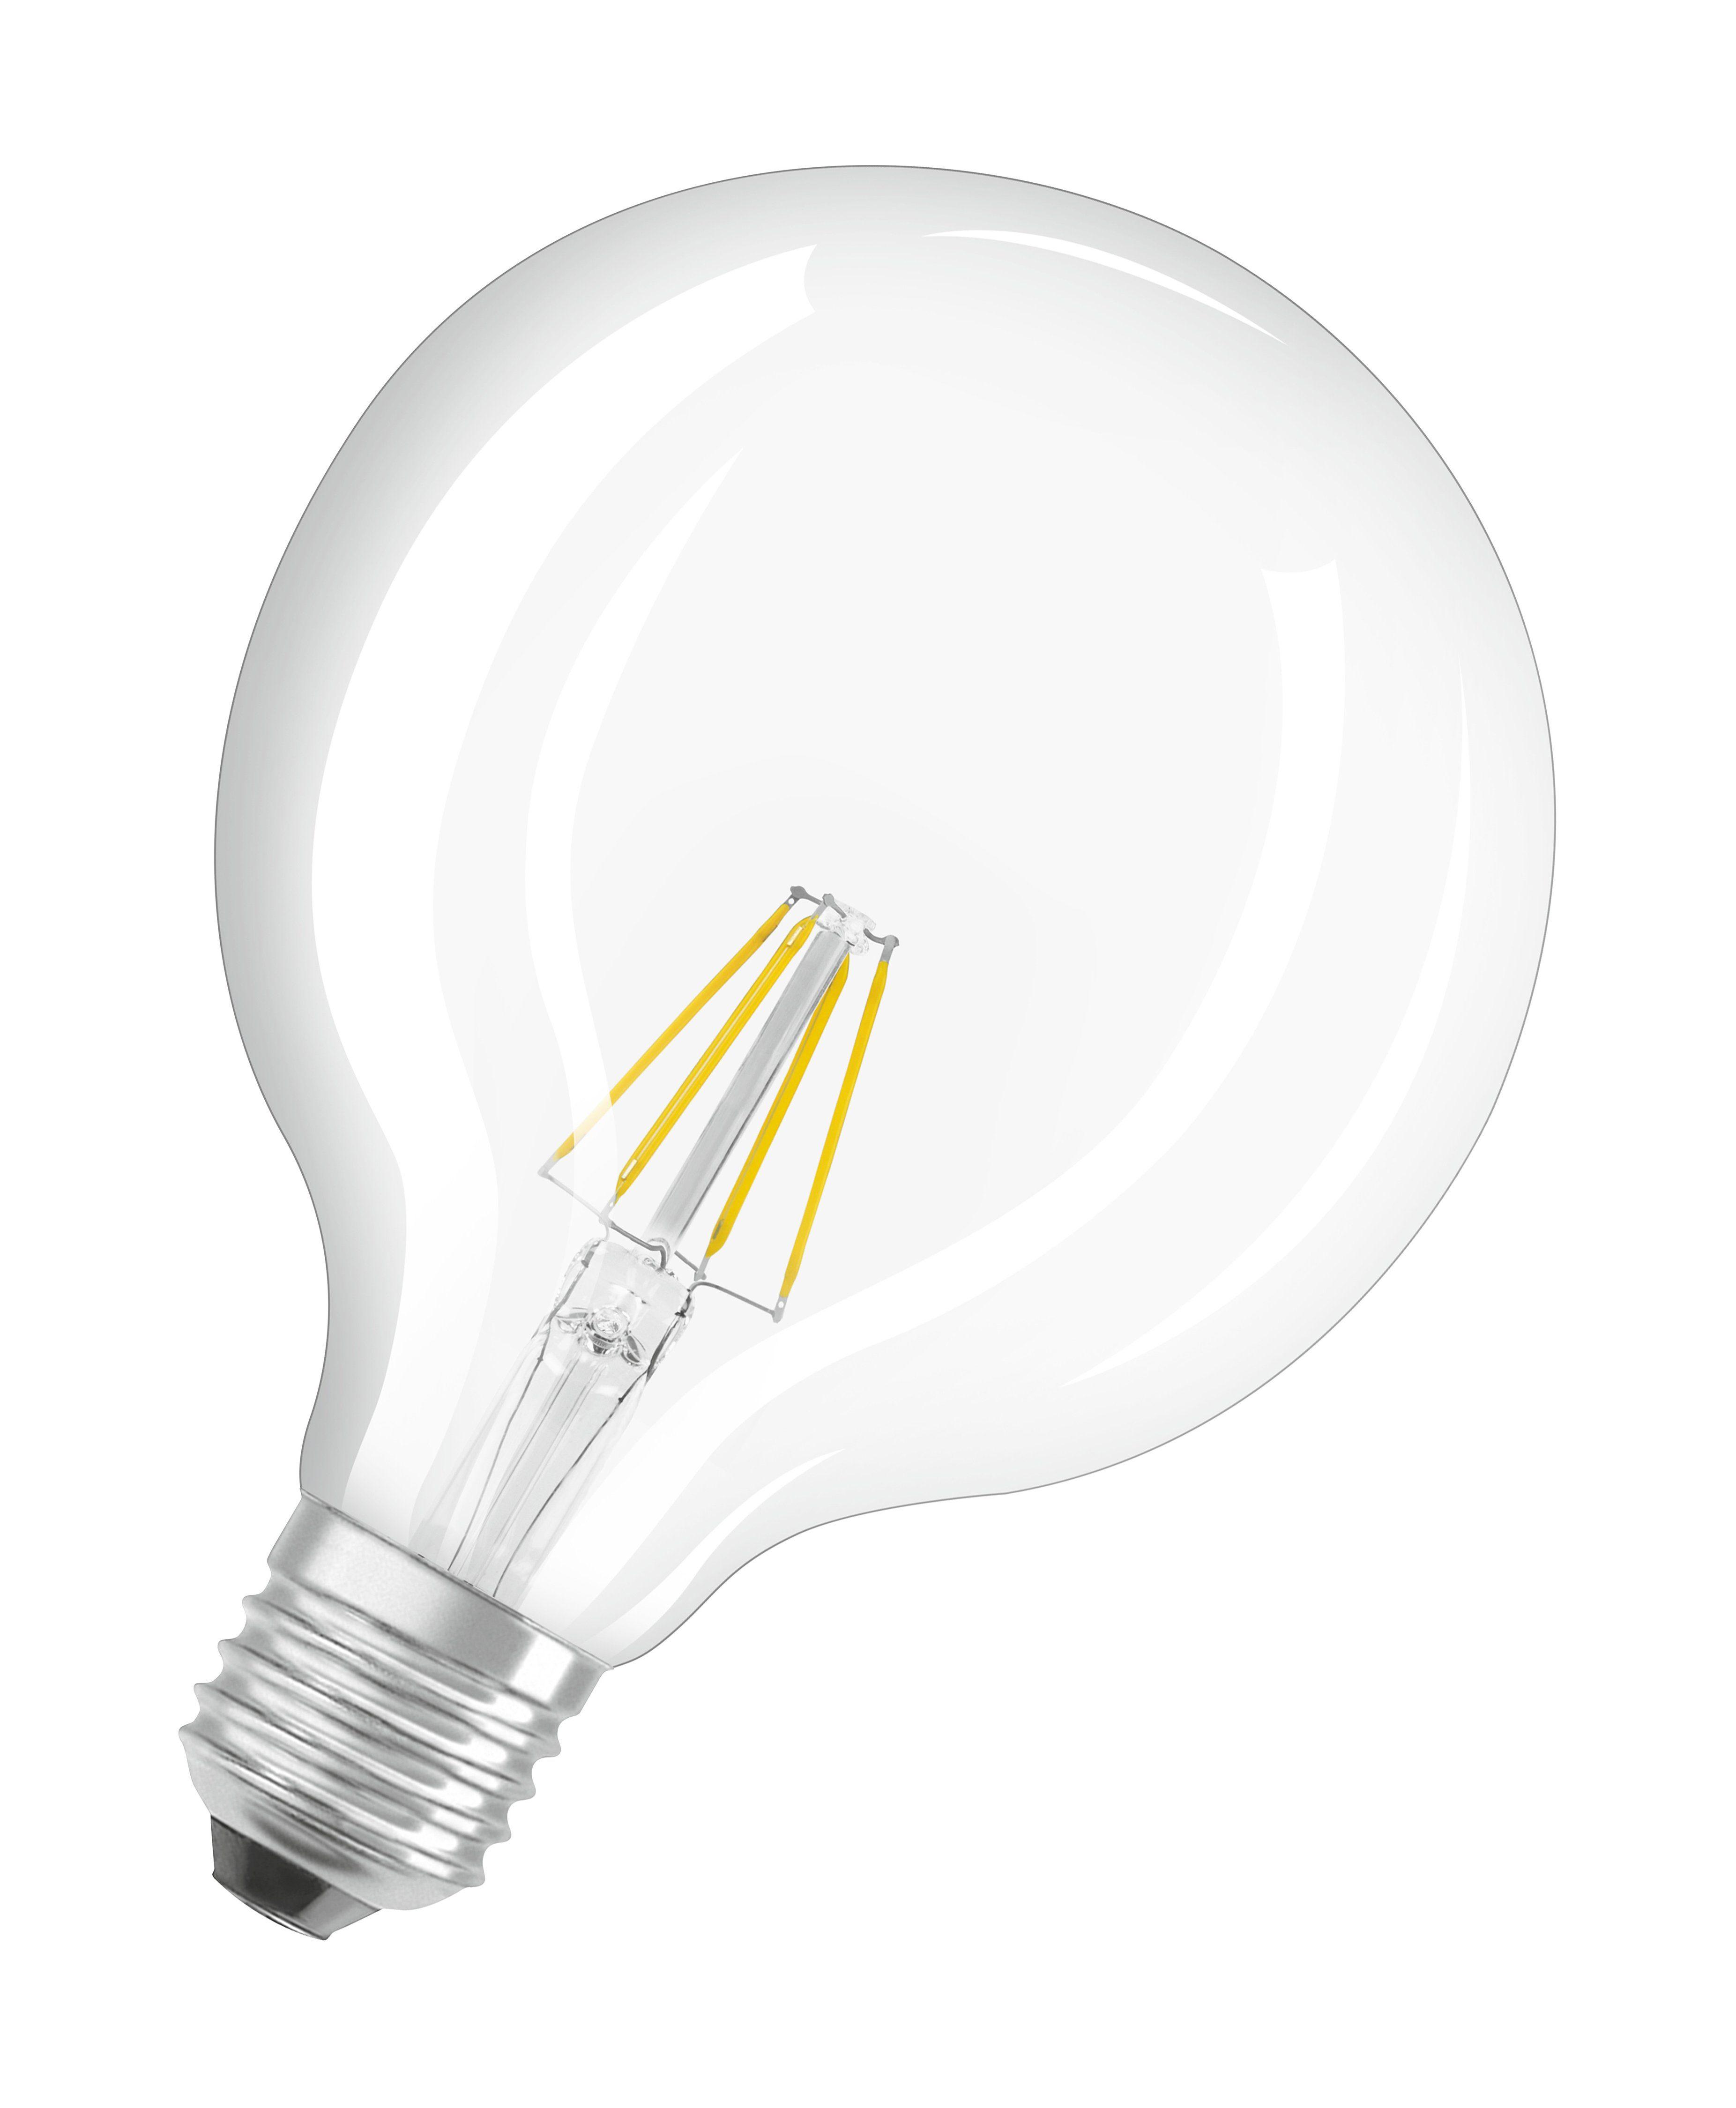 Osram LED Retrofit CLASSIC GLOBE Lampe, LED-Lampe »RF GLOBE 40 4 W/827 E27 FIL«